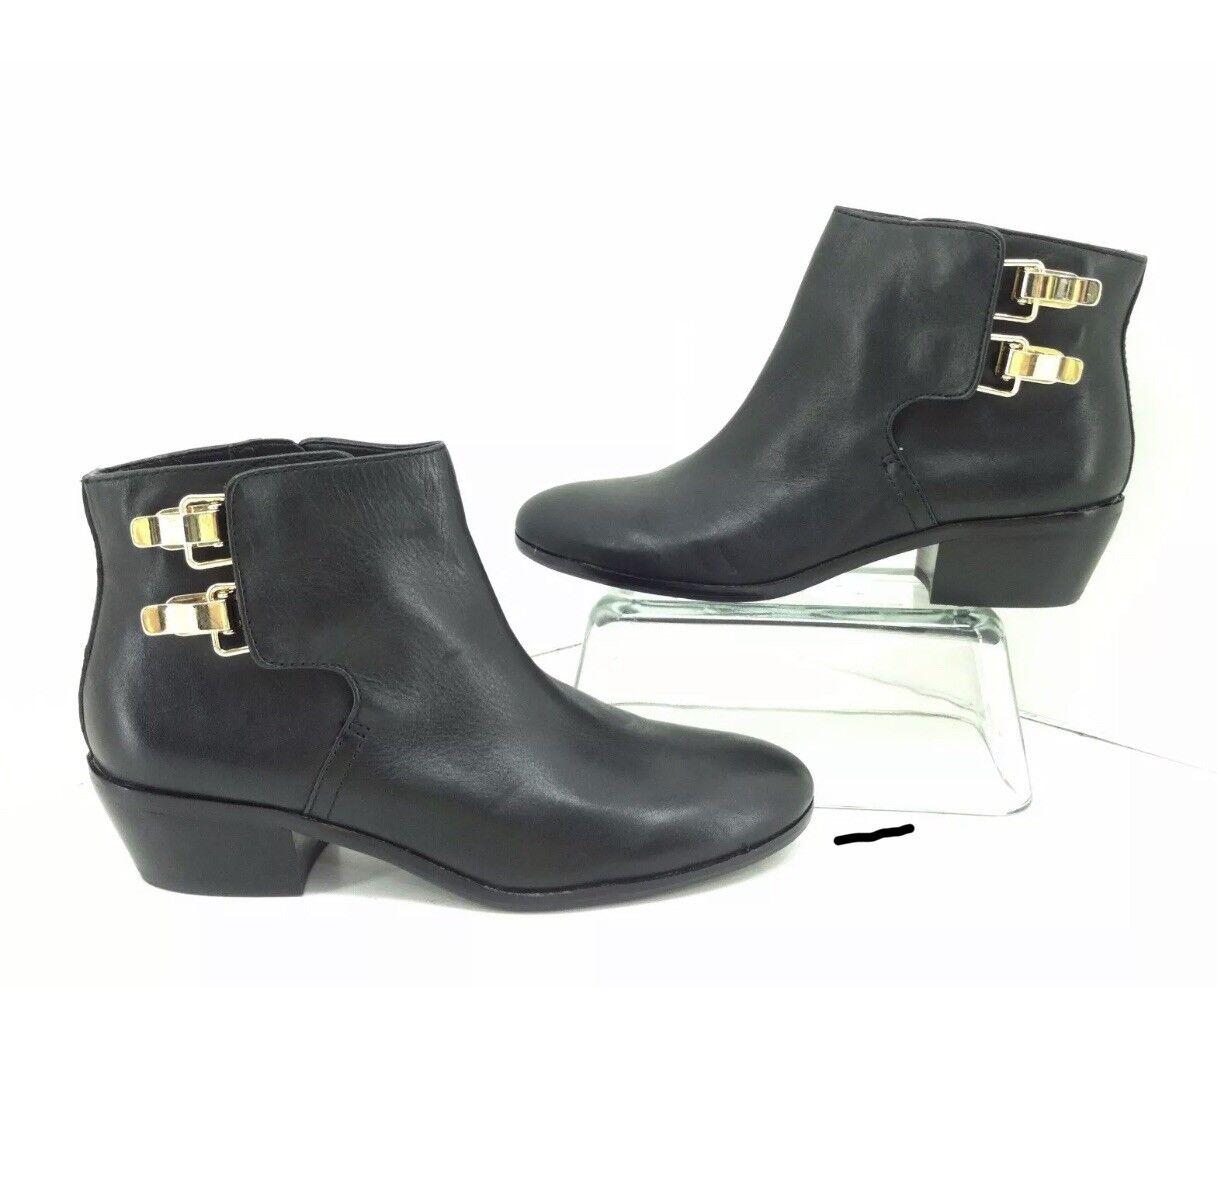 8fd1fffa7 Sam Edelman New Marmont Black Leather Boots Size 7 M Heel Booties  ntagln2831-Women s Boots